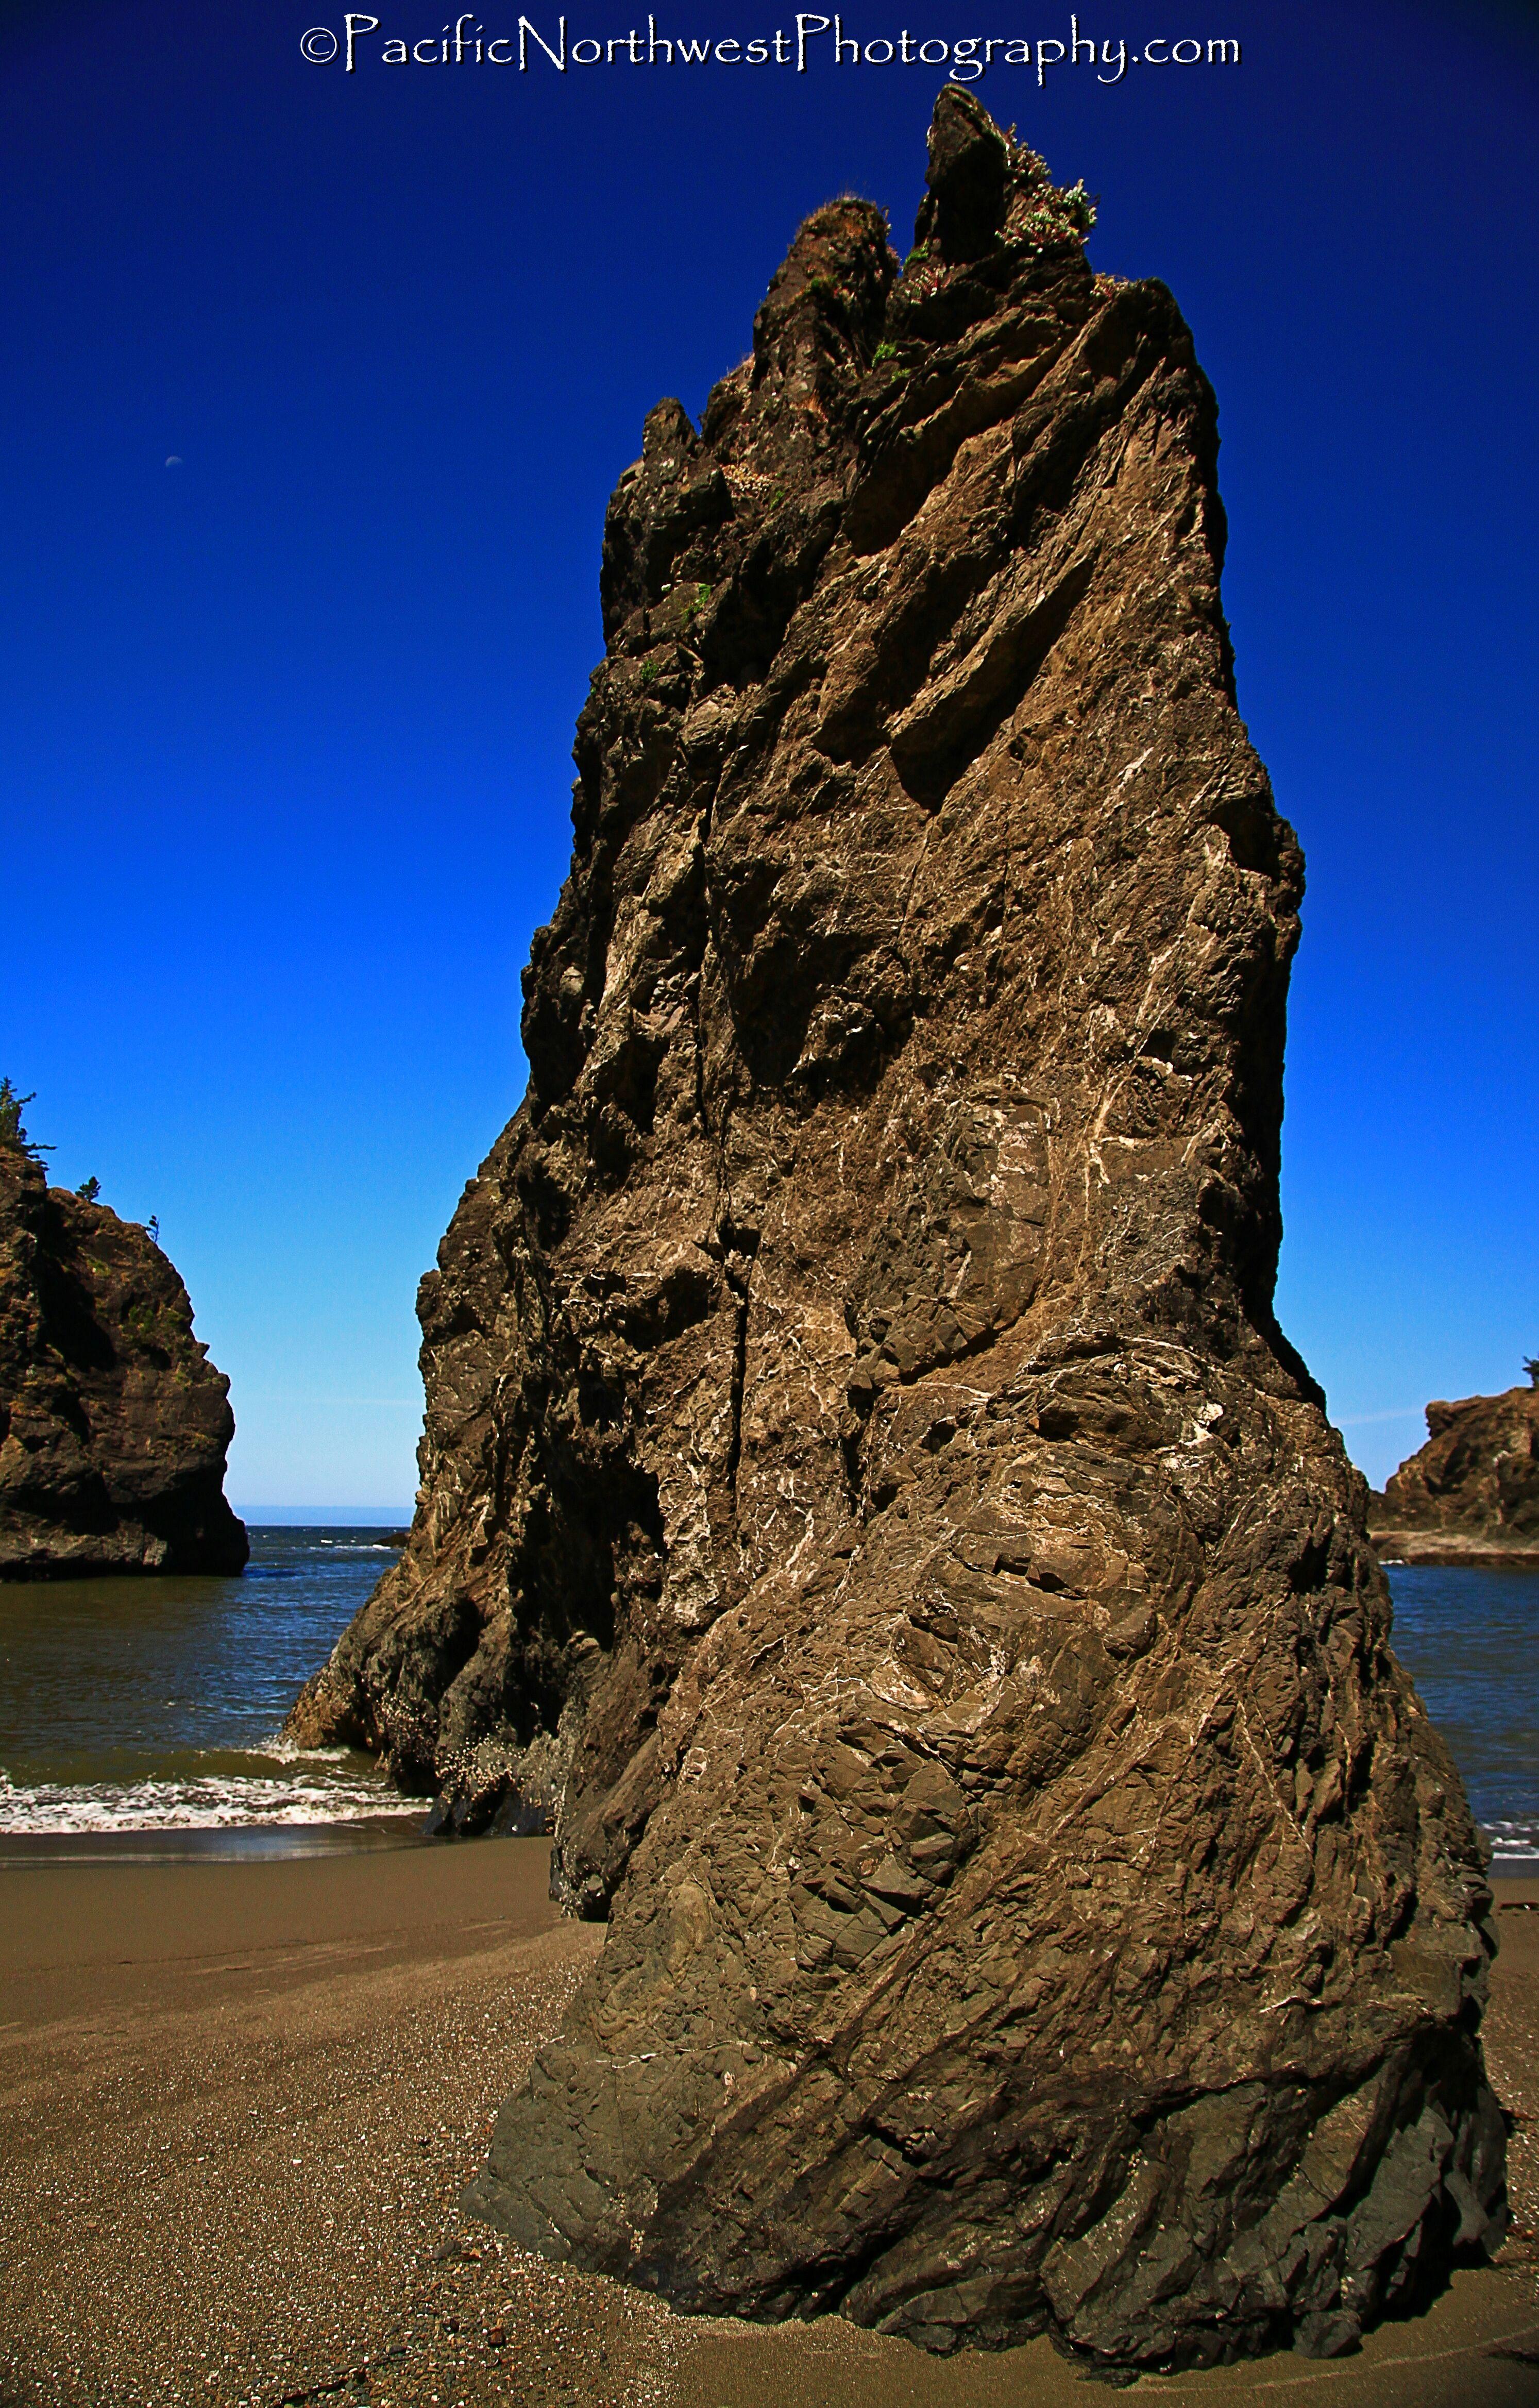 rocks, sky and beach